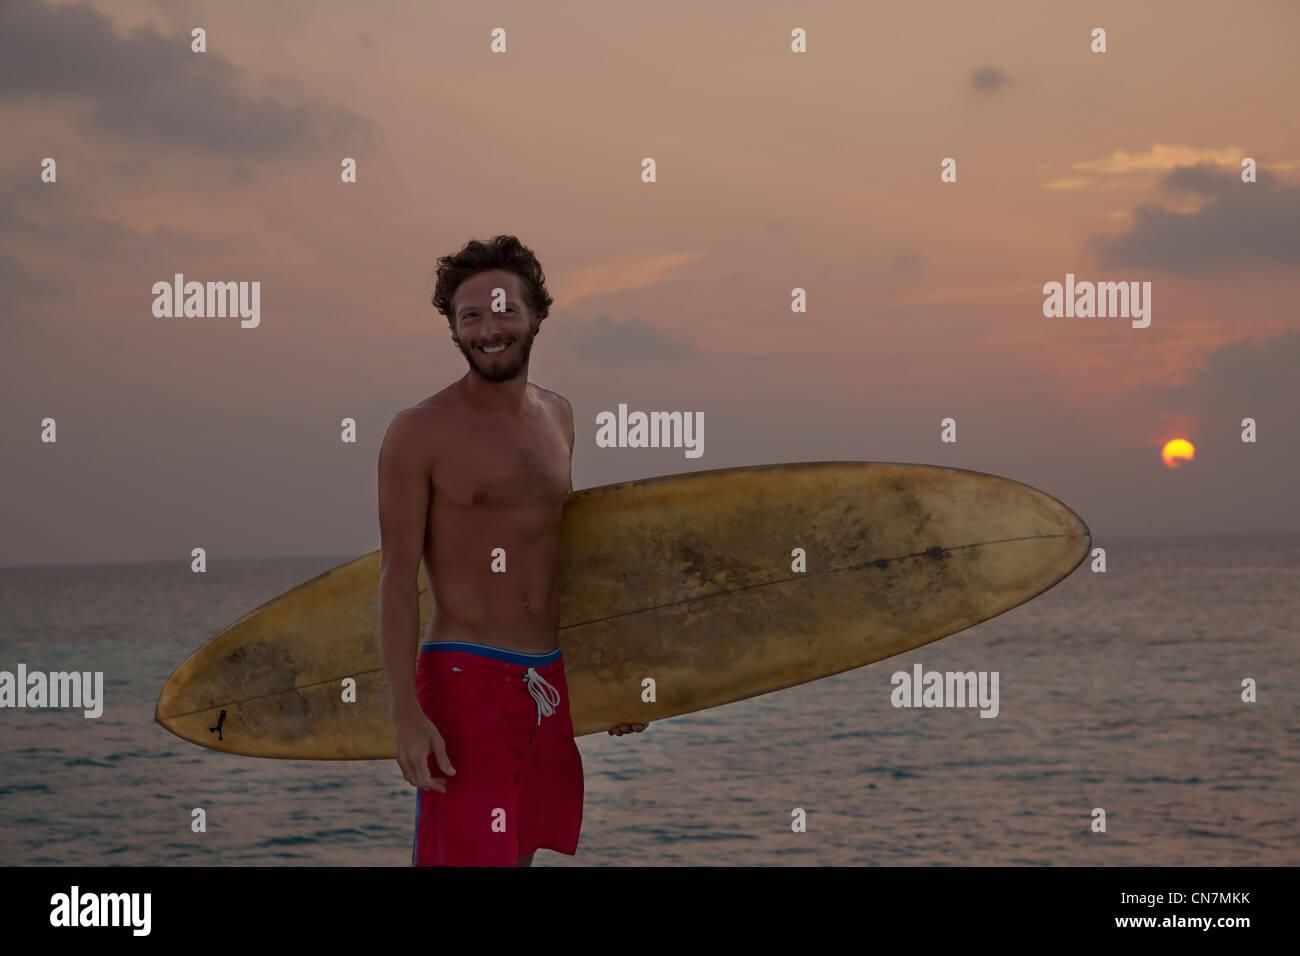 Surfer tragen Board am Strand bei Sonnenuntergang Stockbild